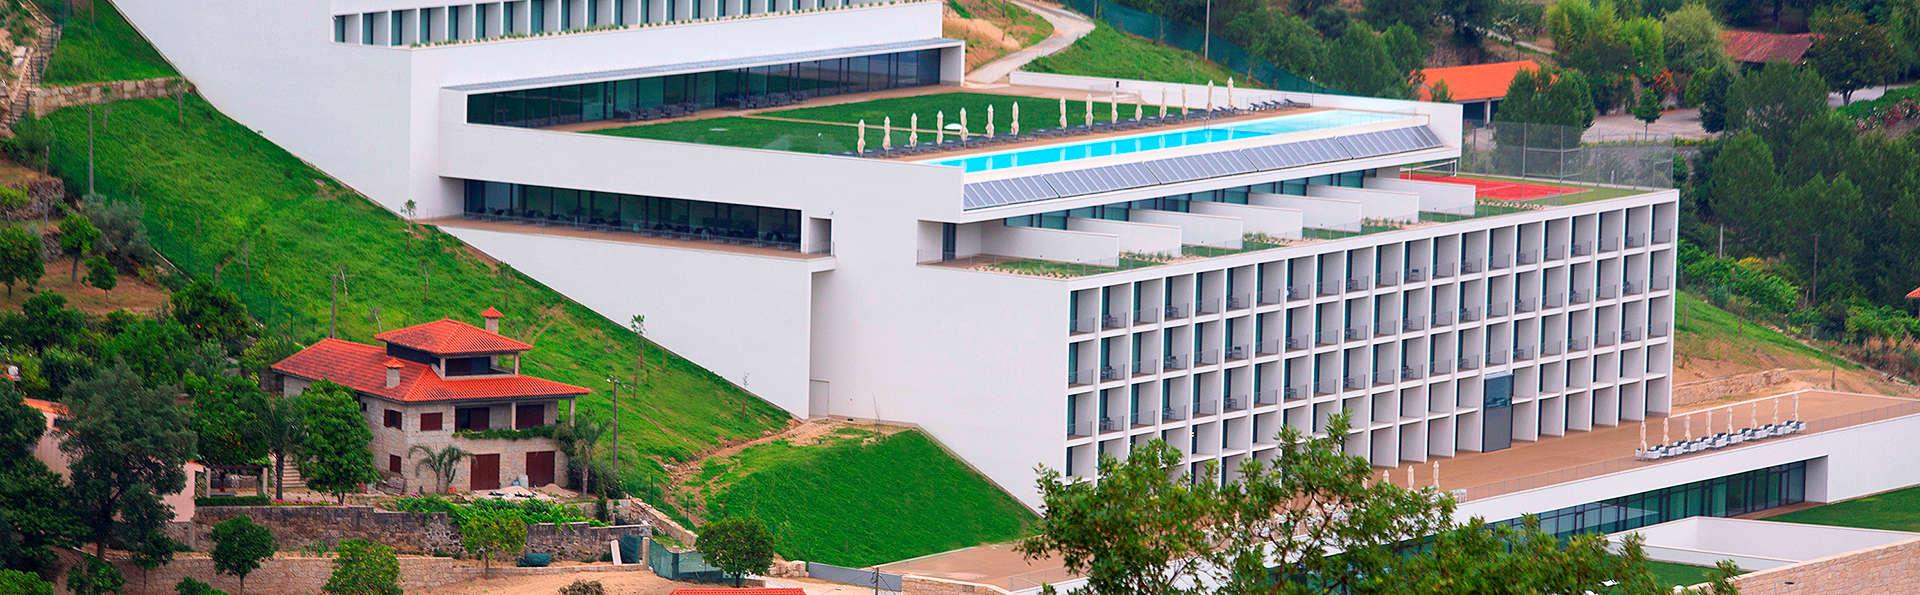 Douro Royal Valley Hotel & Spa - EDIT_Exterior.jpg